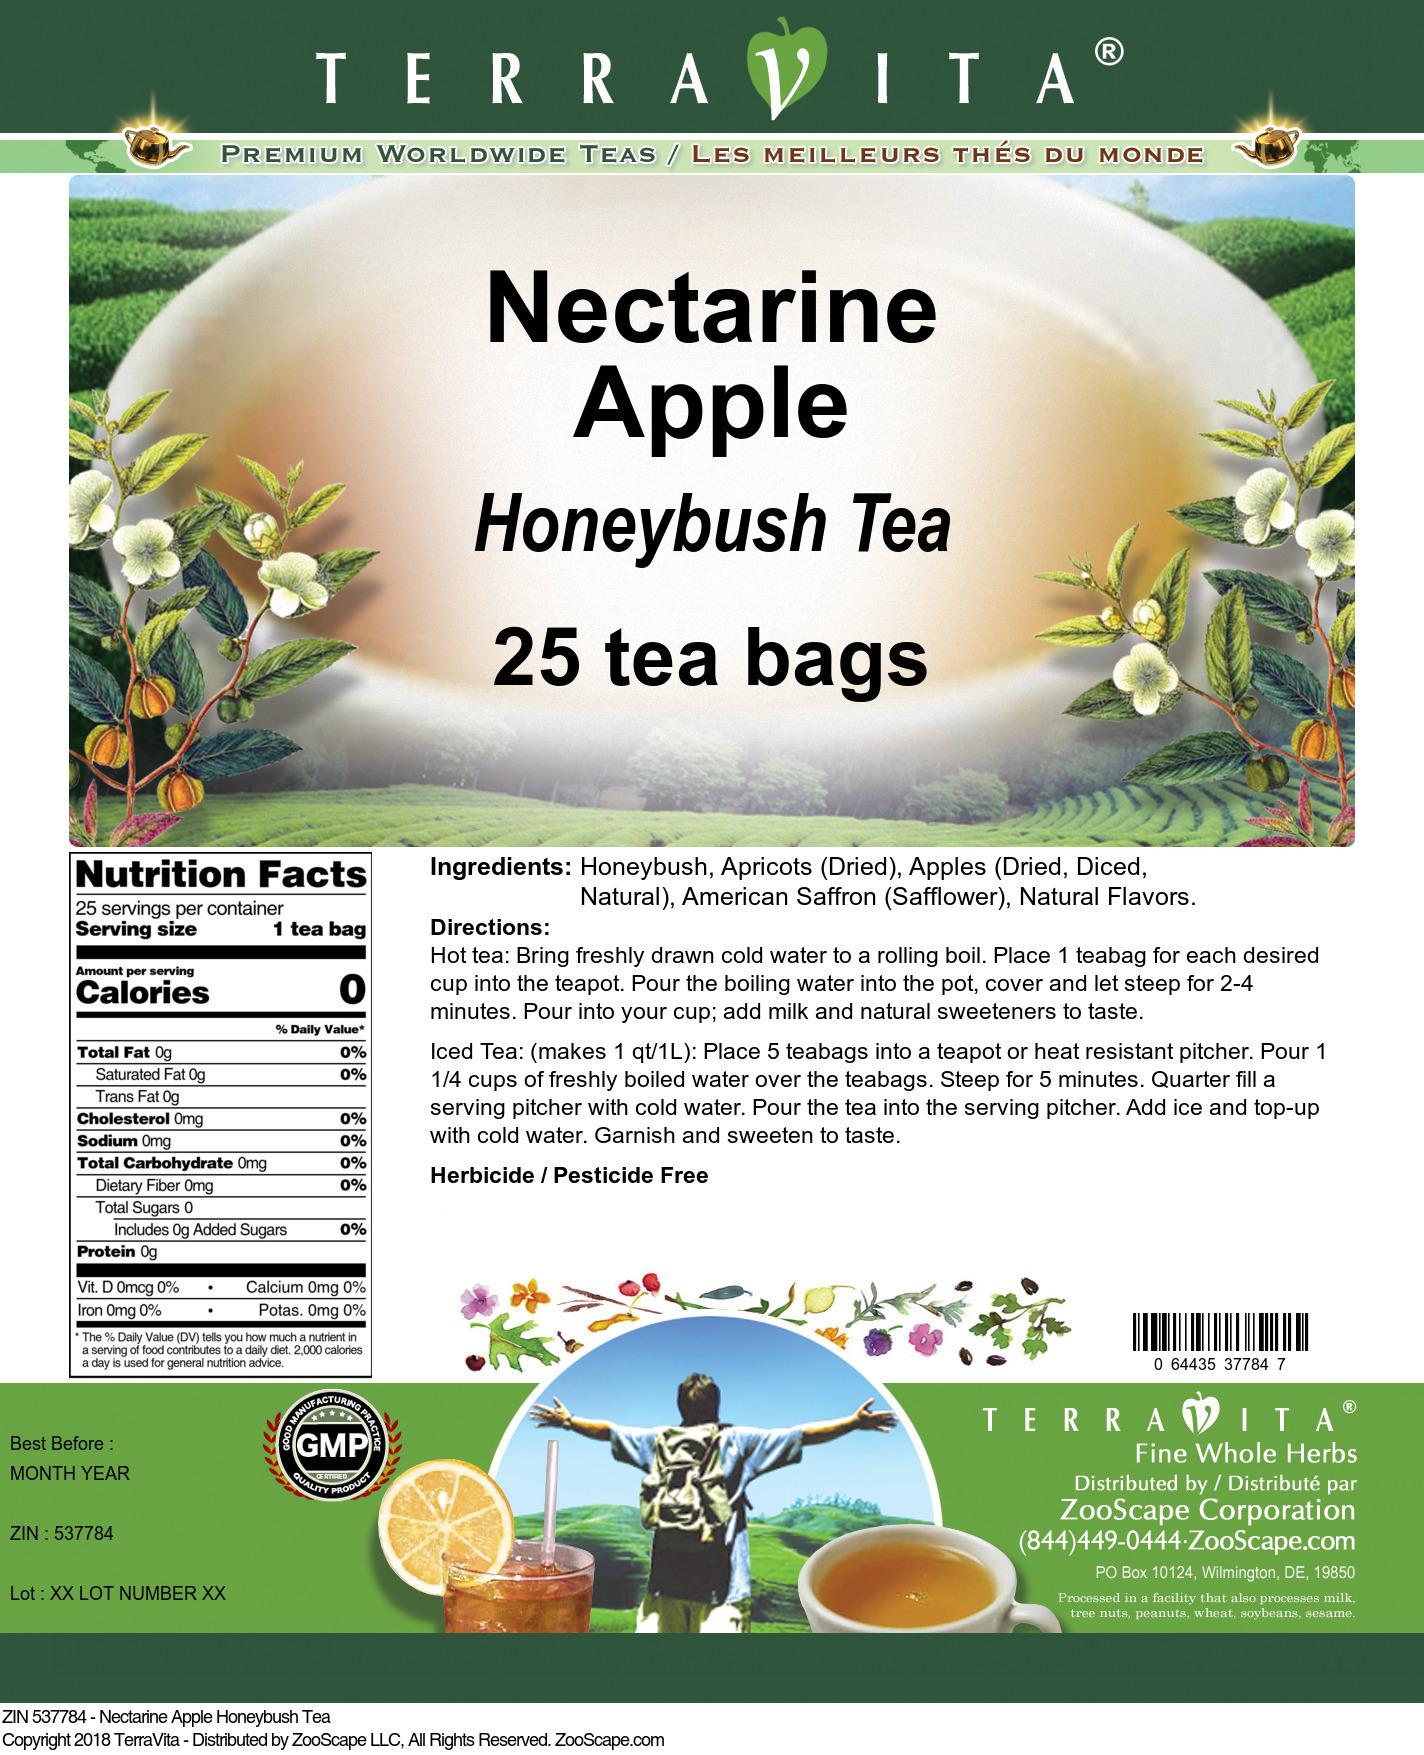 Nectarine Apple Honeybush Tea